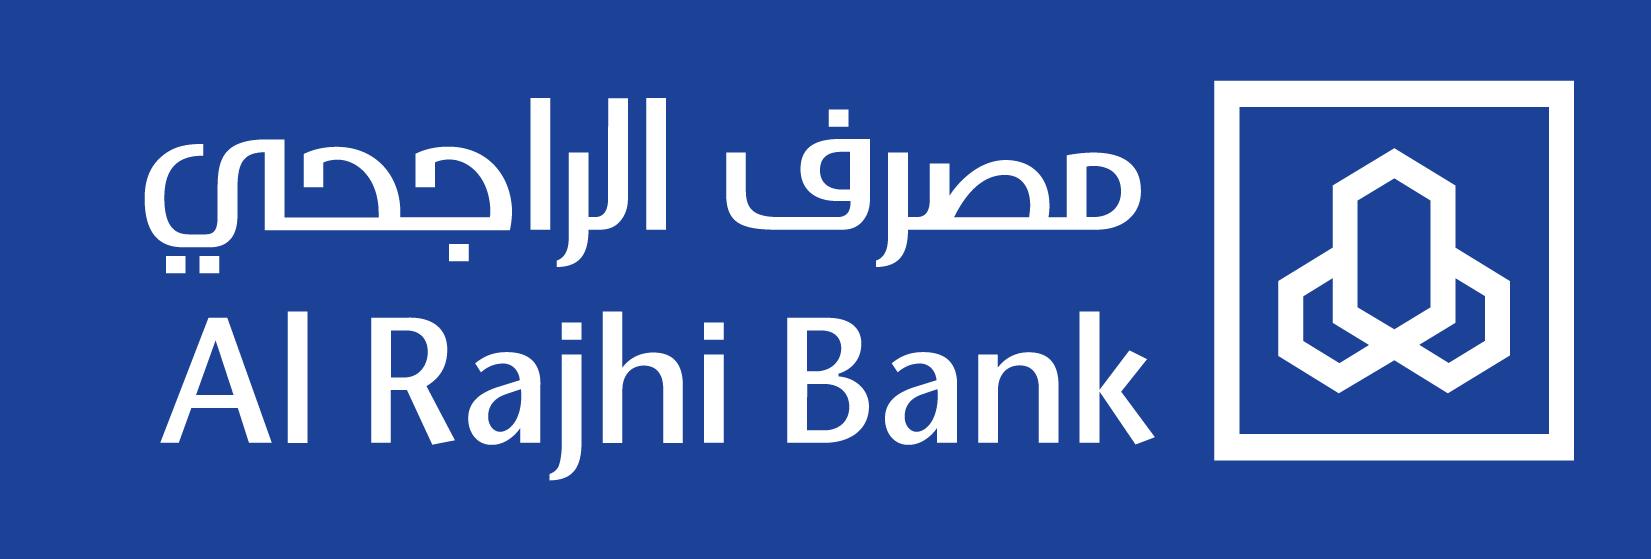 Al Rajhi Bank Logo png